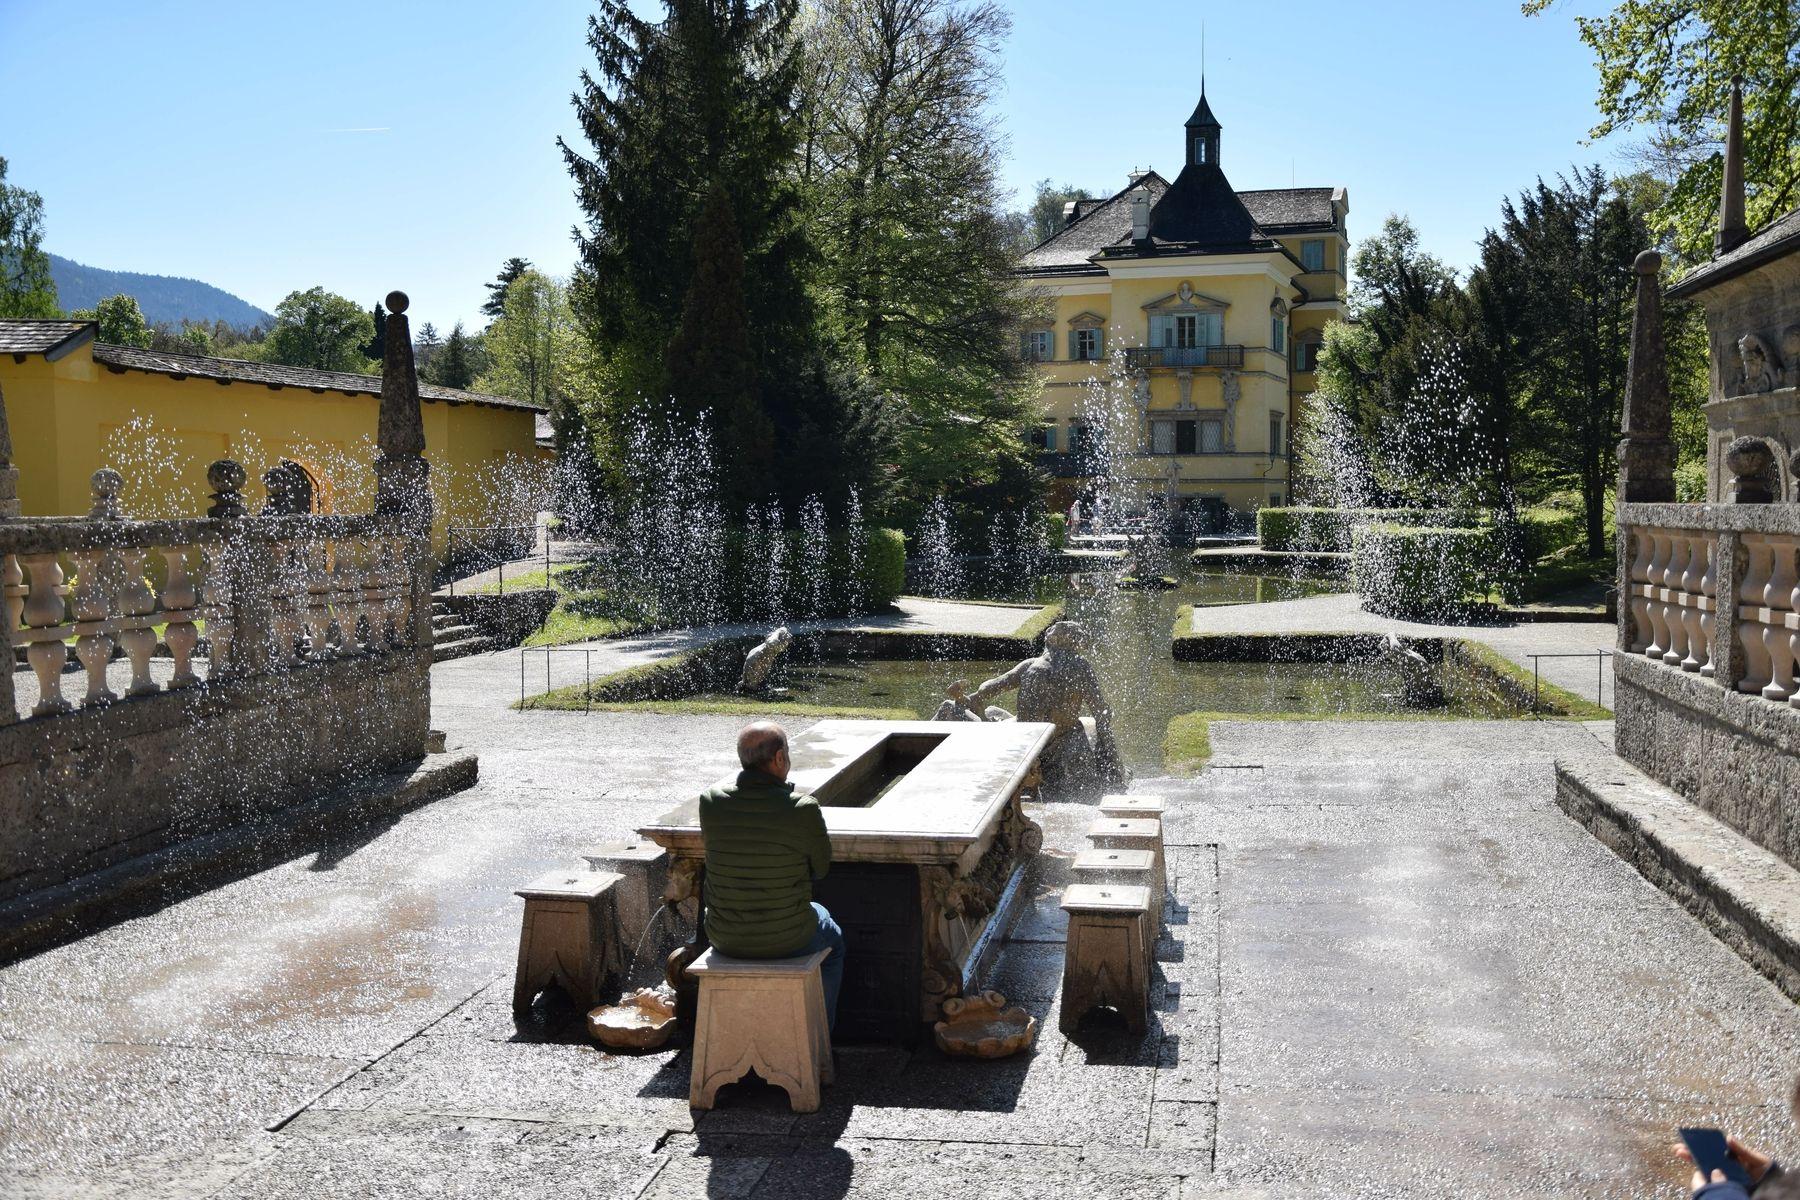 Giochi d'acqua a Hellbrunn